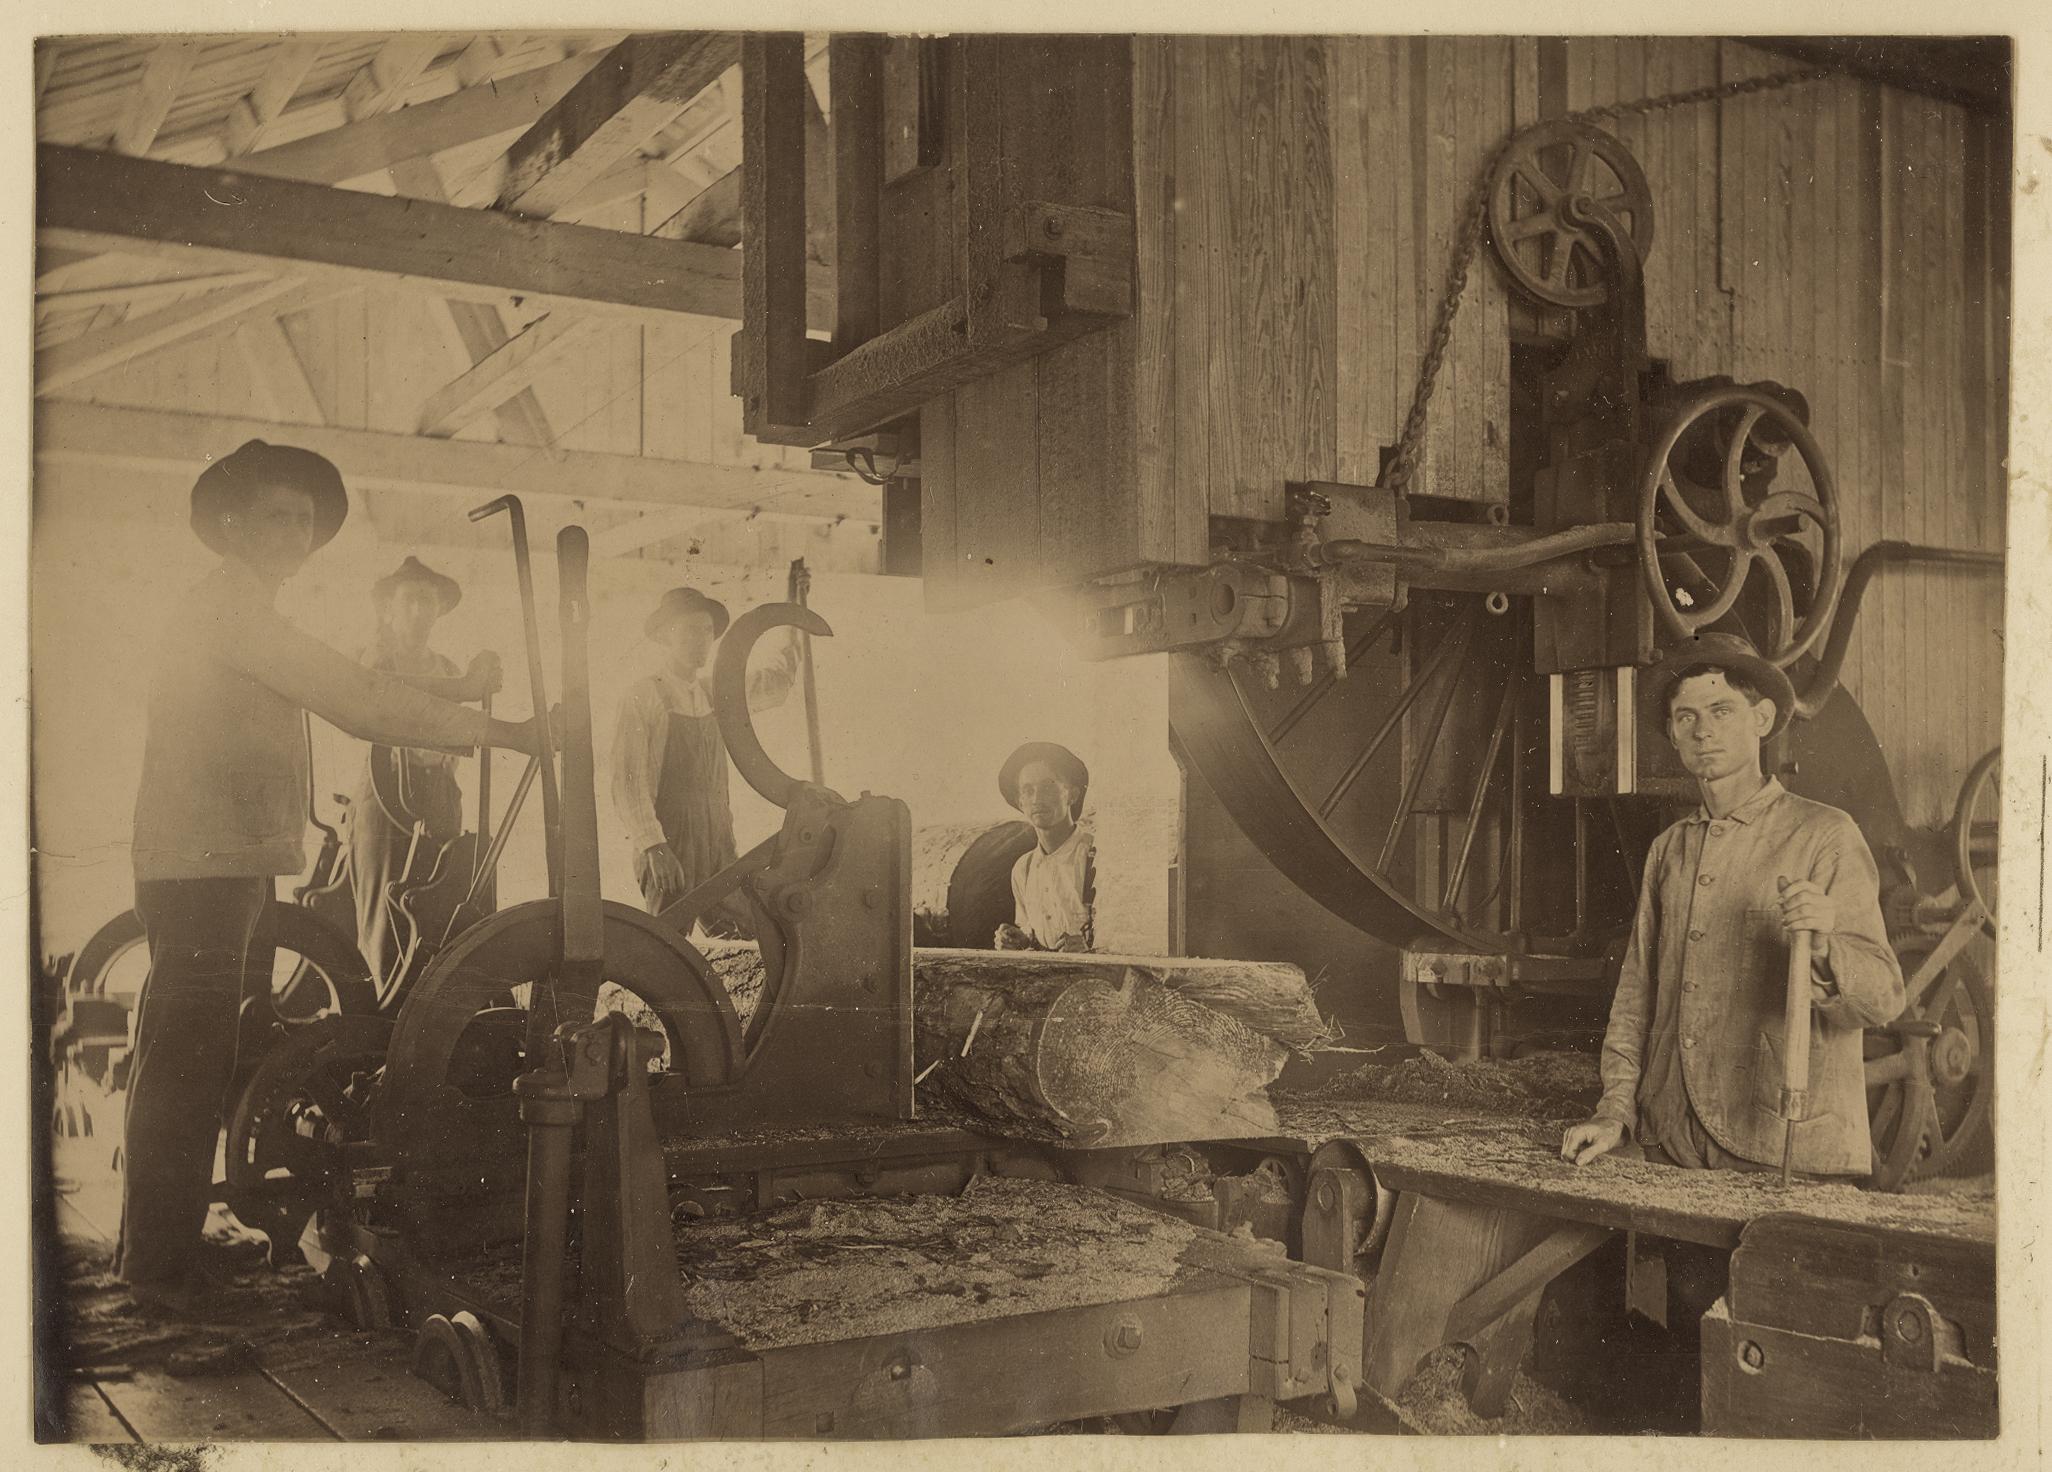 Sawmill Carriage (1903)